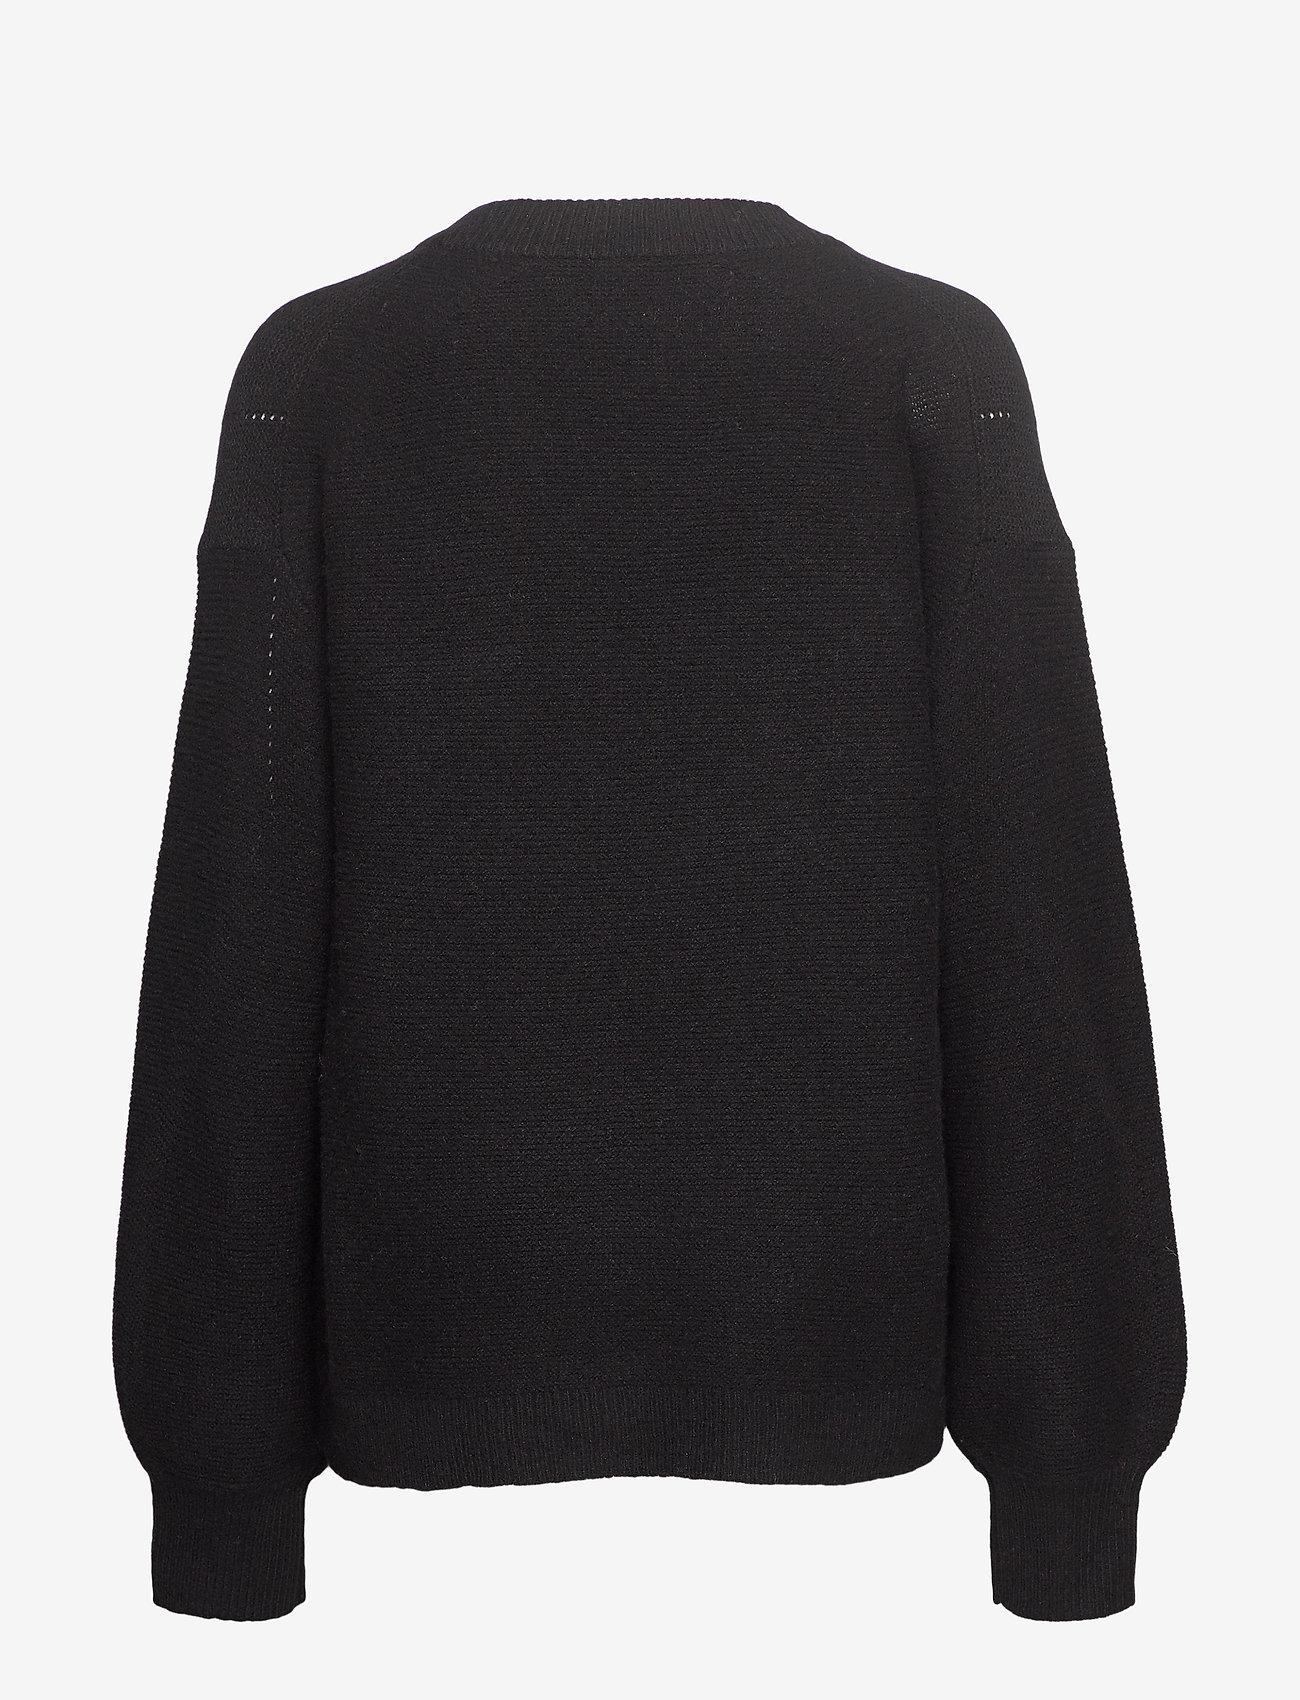 Silvia Sweater (Black) (1069.75 kr) - DESIGNERS, REMIX